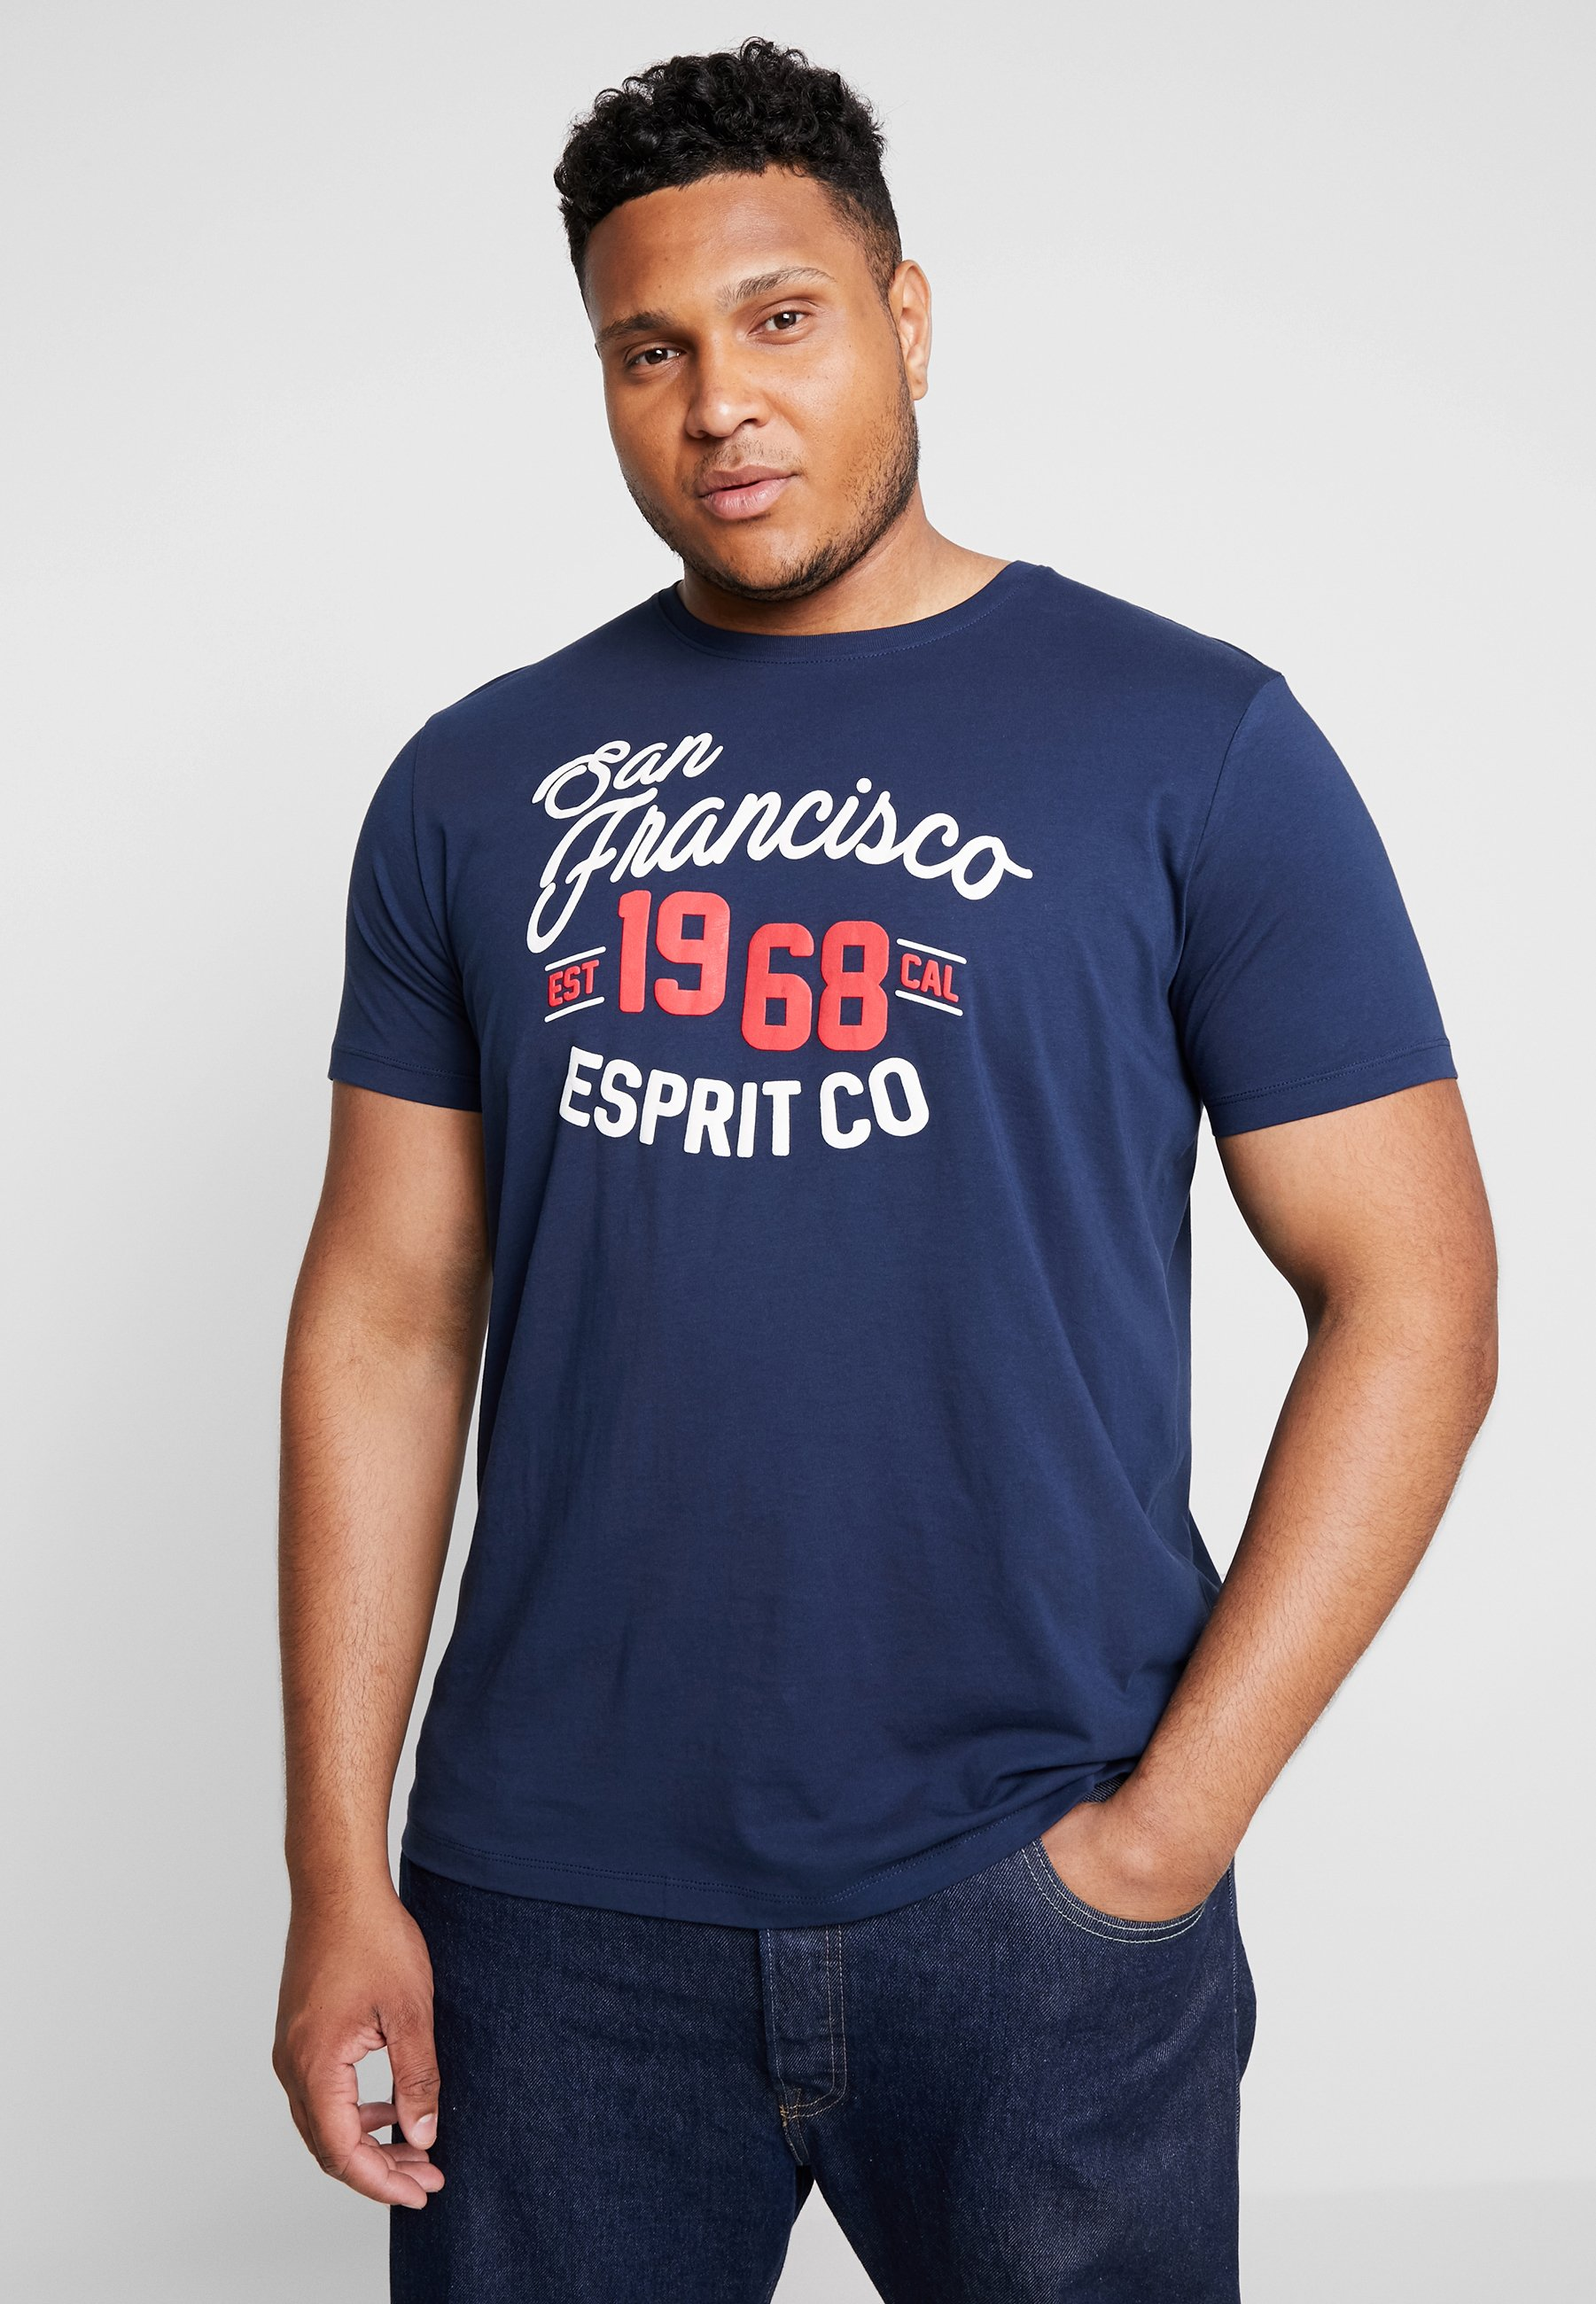 shirt Navy Imprimé Imprimé BigT Navy BigT shirt Esprit Esprit XiPTOZuk